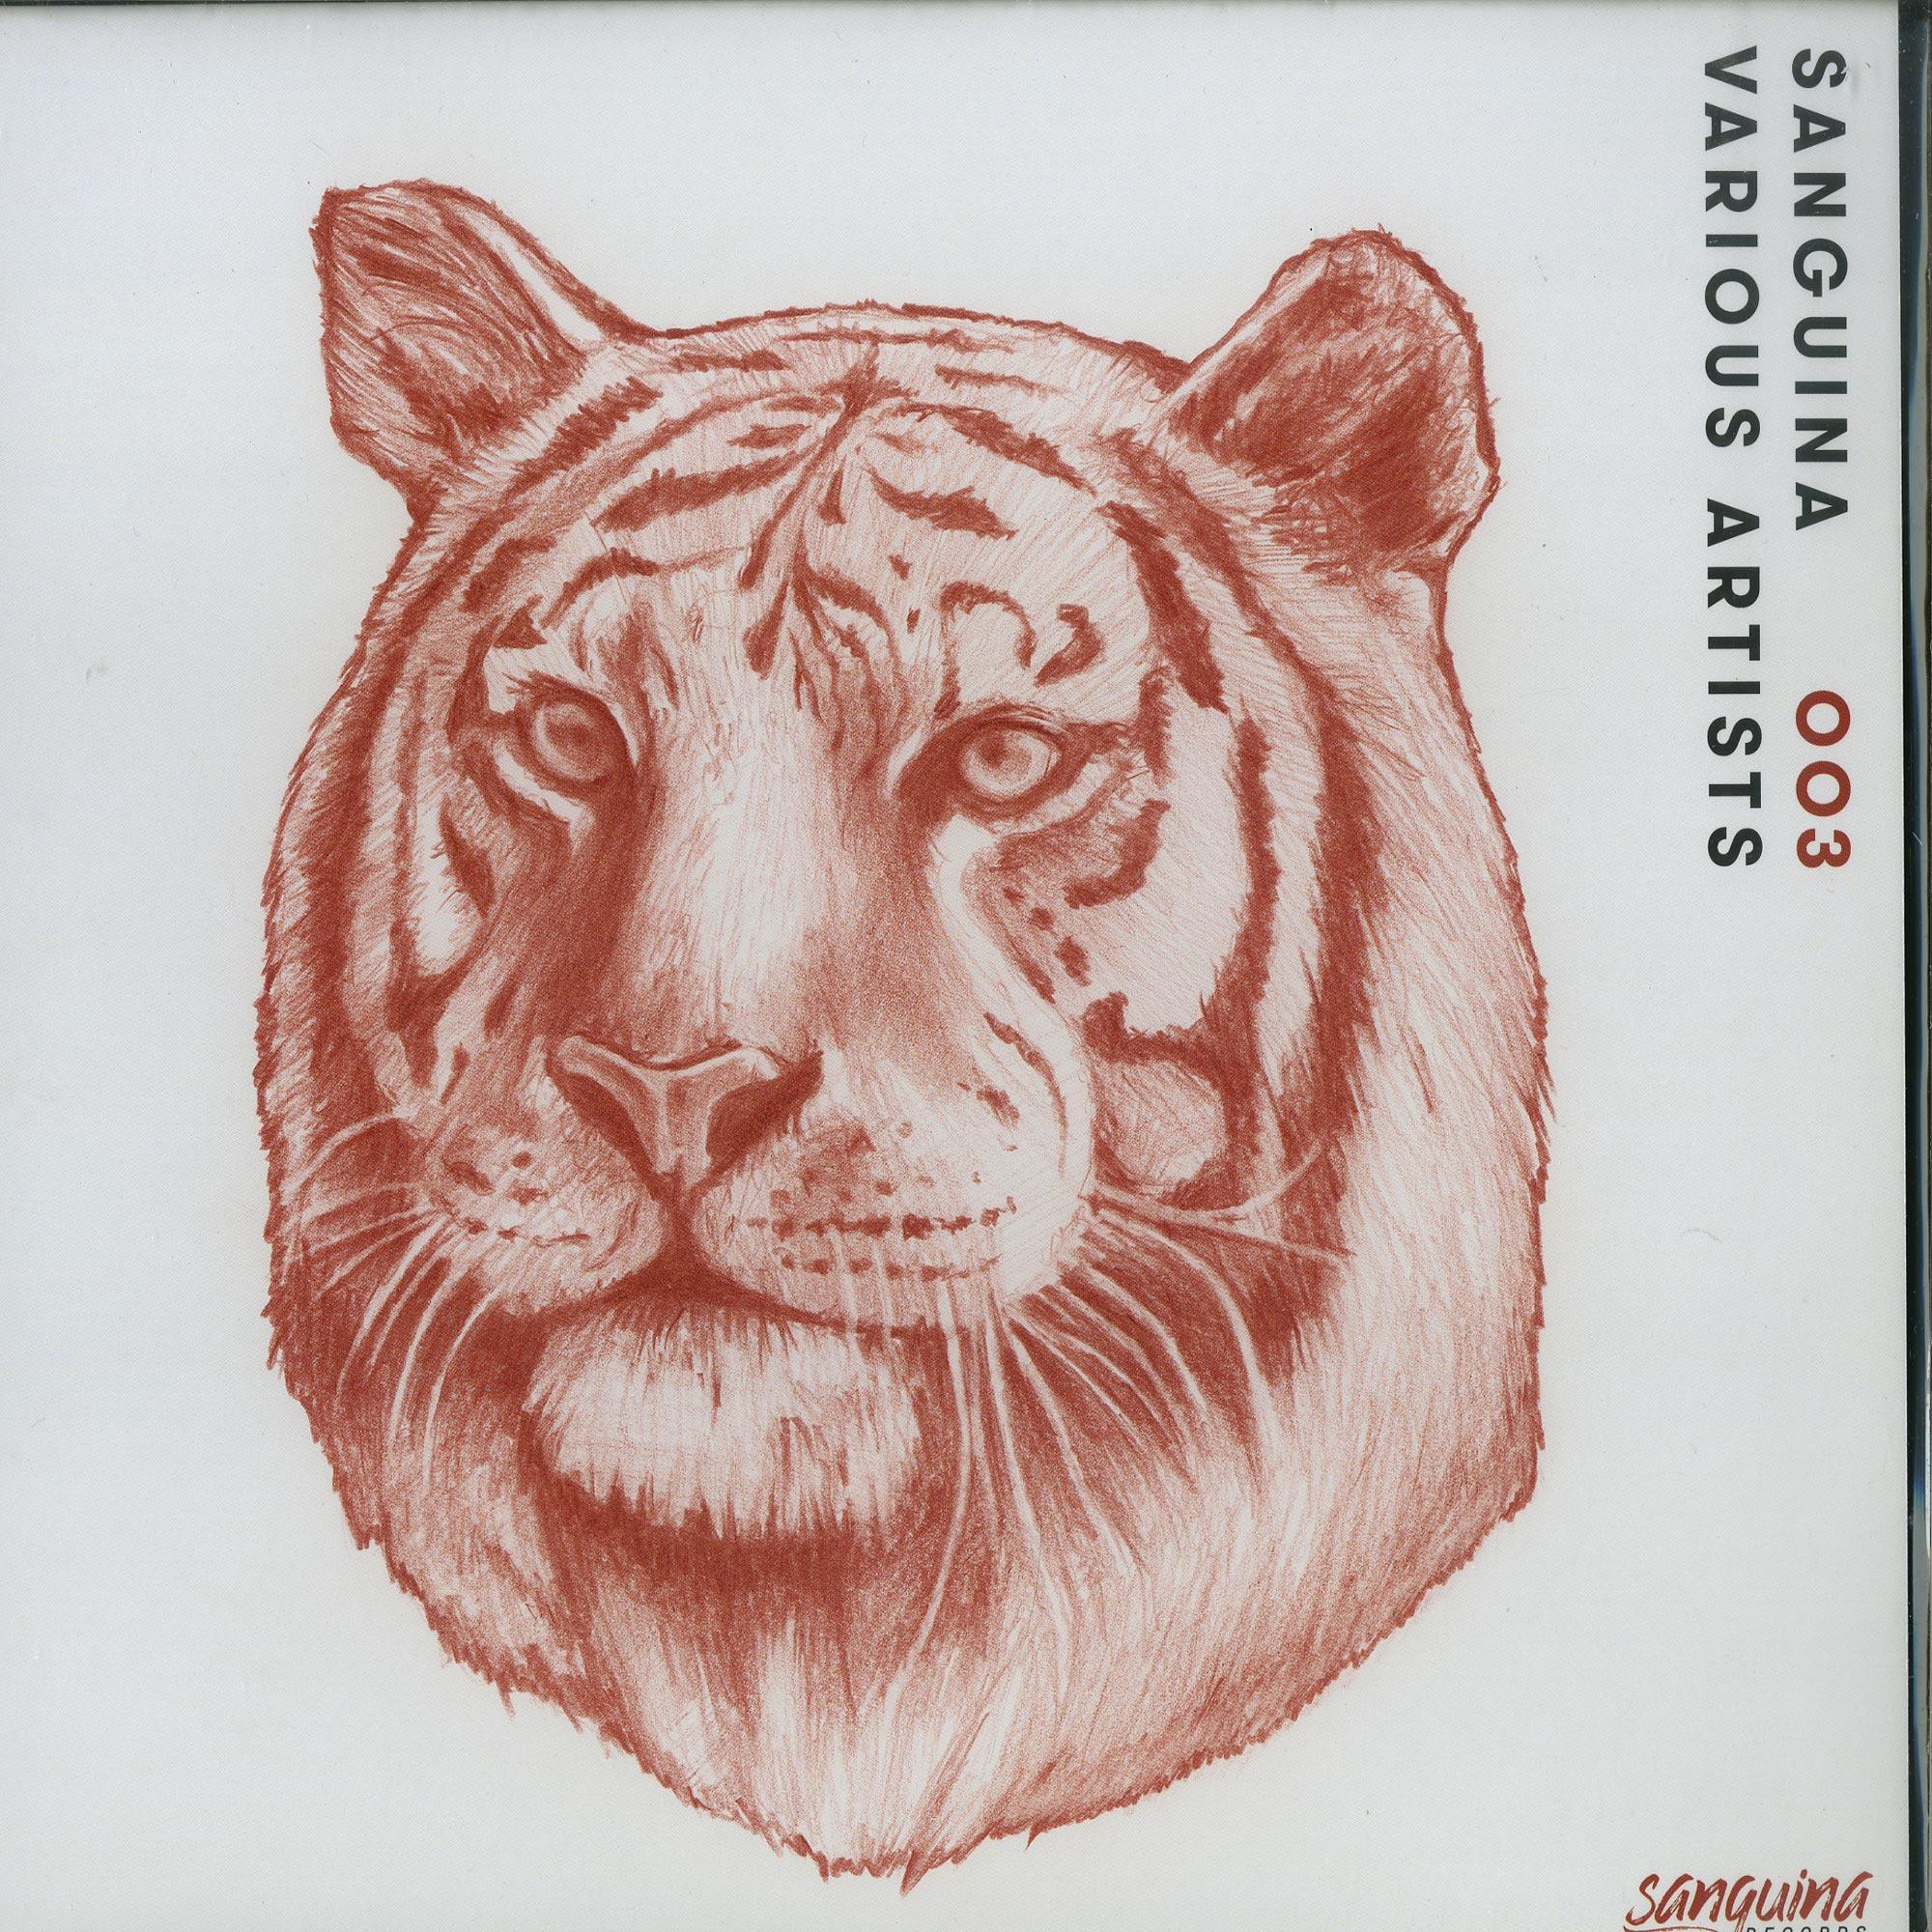 Herck, Mendoza & Miguelle, Michel Degen, Fulvio Cala - SANGUINA 003 - VARIOUS ARTISTS